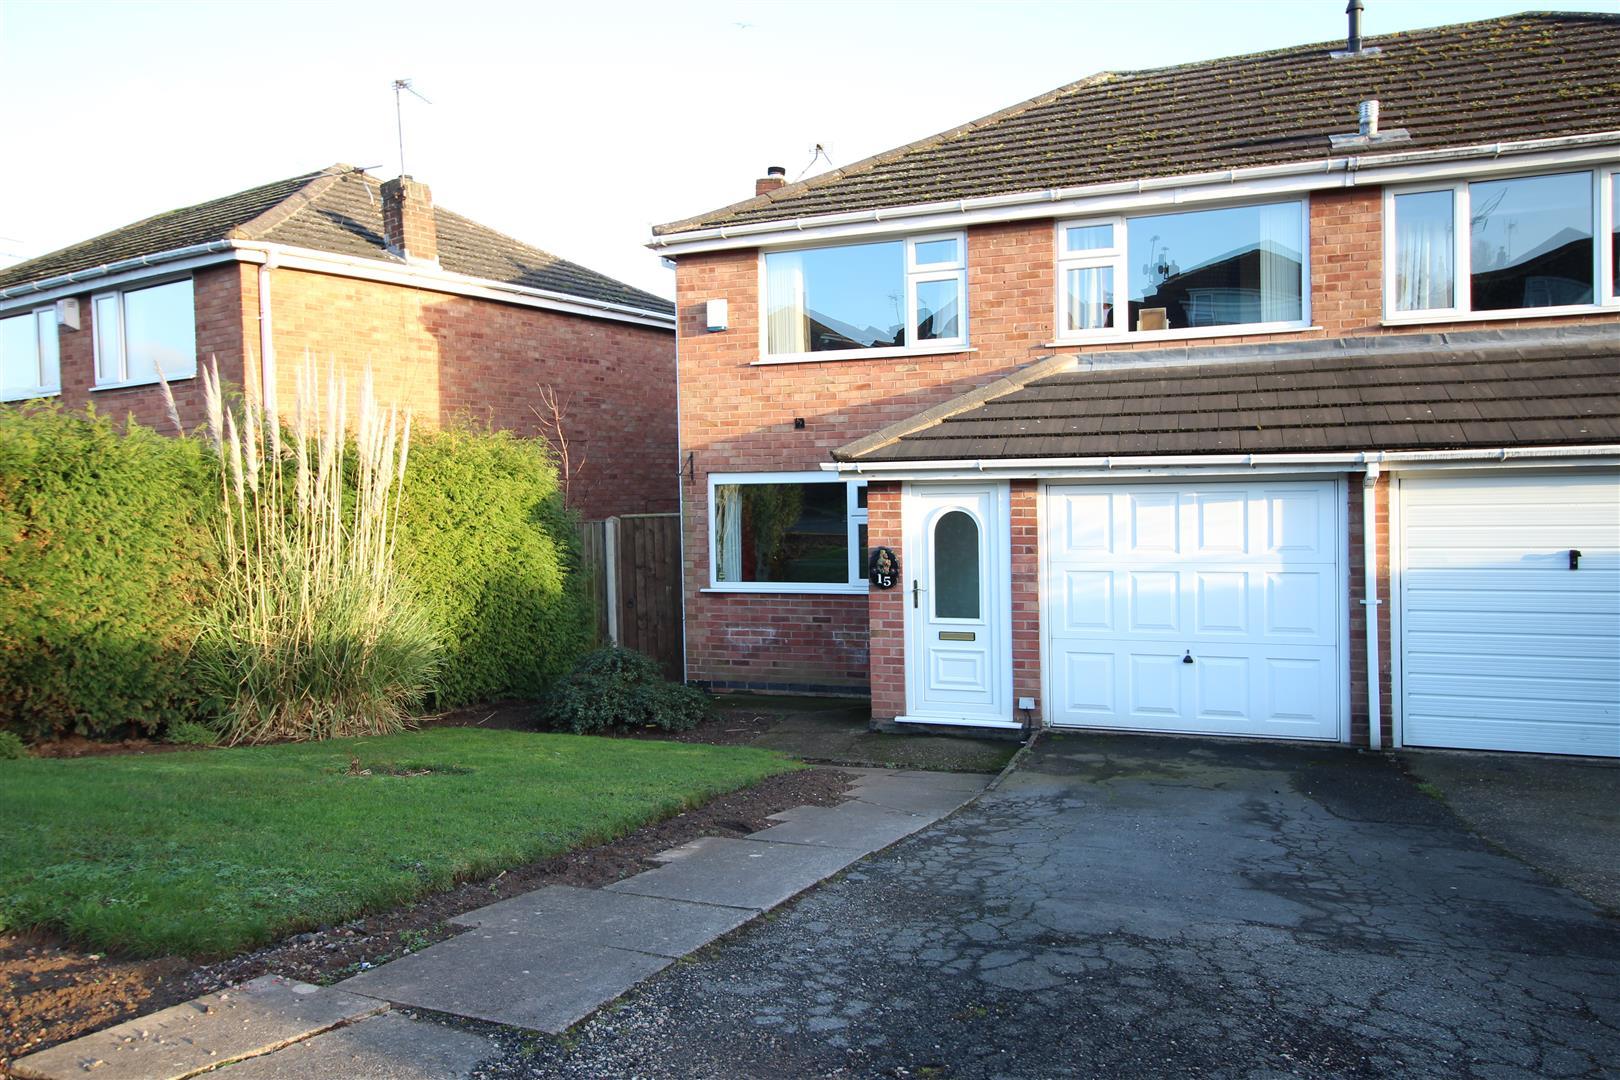 3 Bedrooms Semi Detached House for sale in Mountfield Avenue, Sandiacre, Nottingham